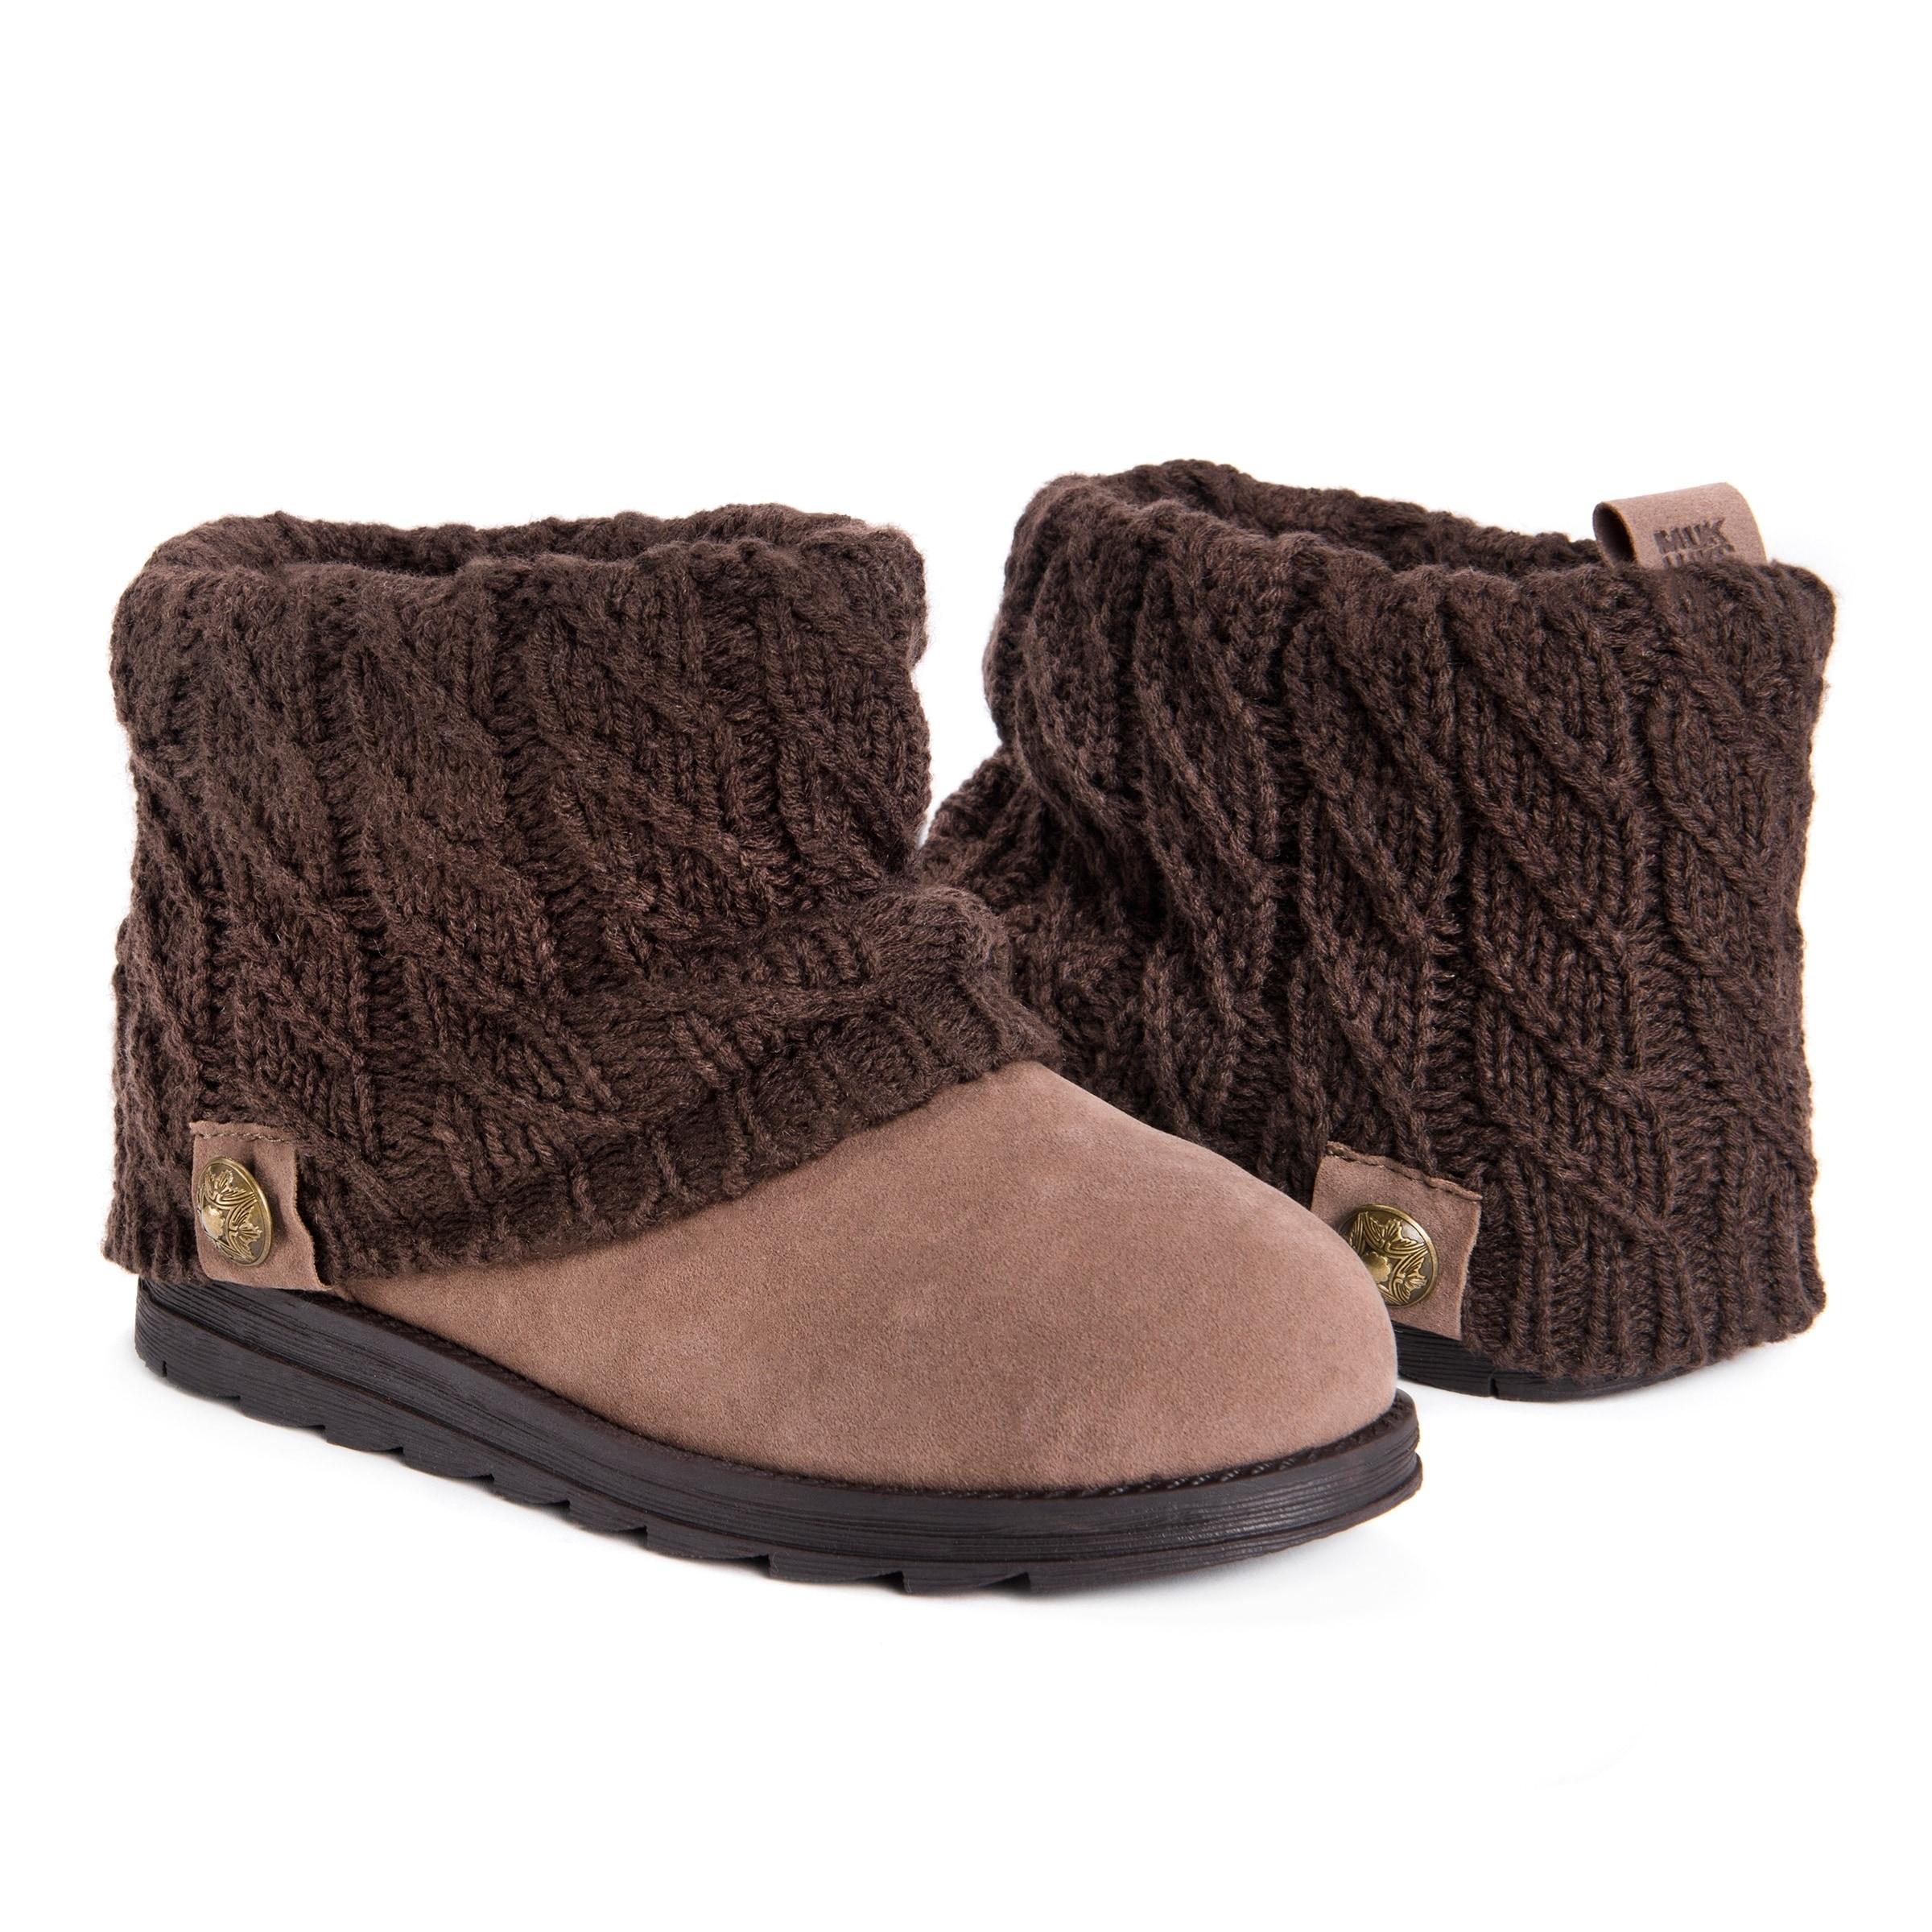 bae764da6586 Shop MUK LUKS® Women s Patti Short Boots - Free Shipping Today - Overstock  - 22895481